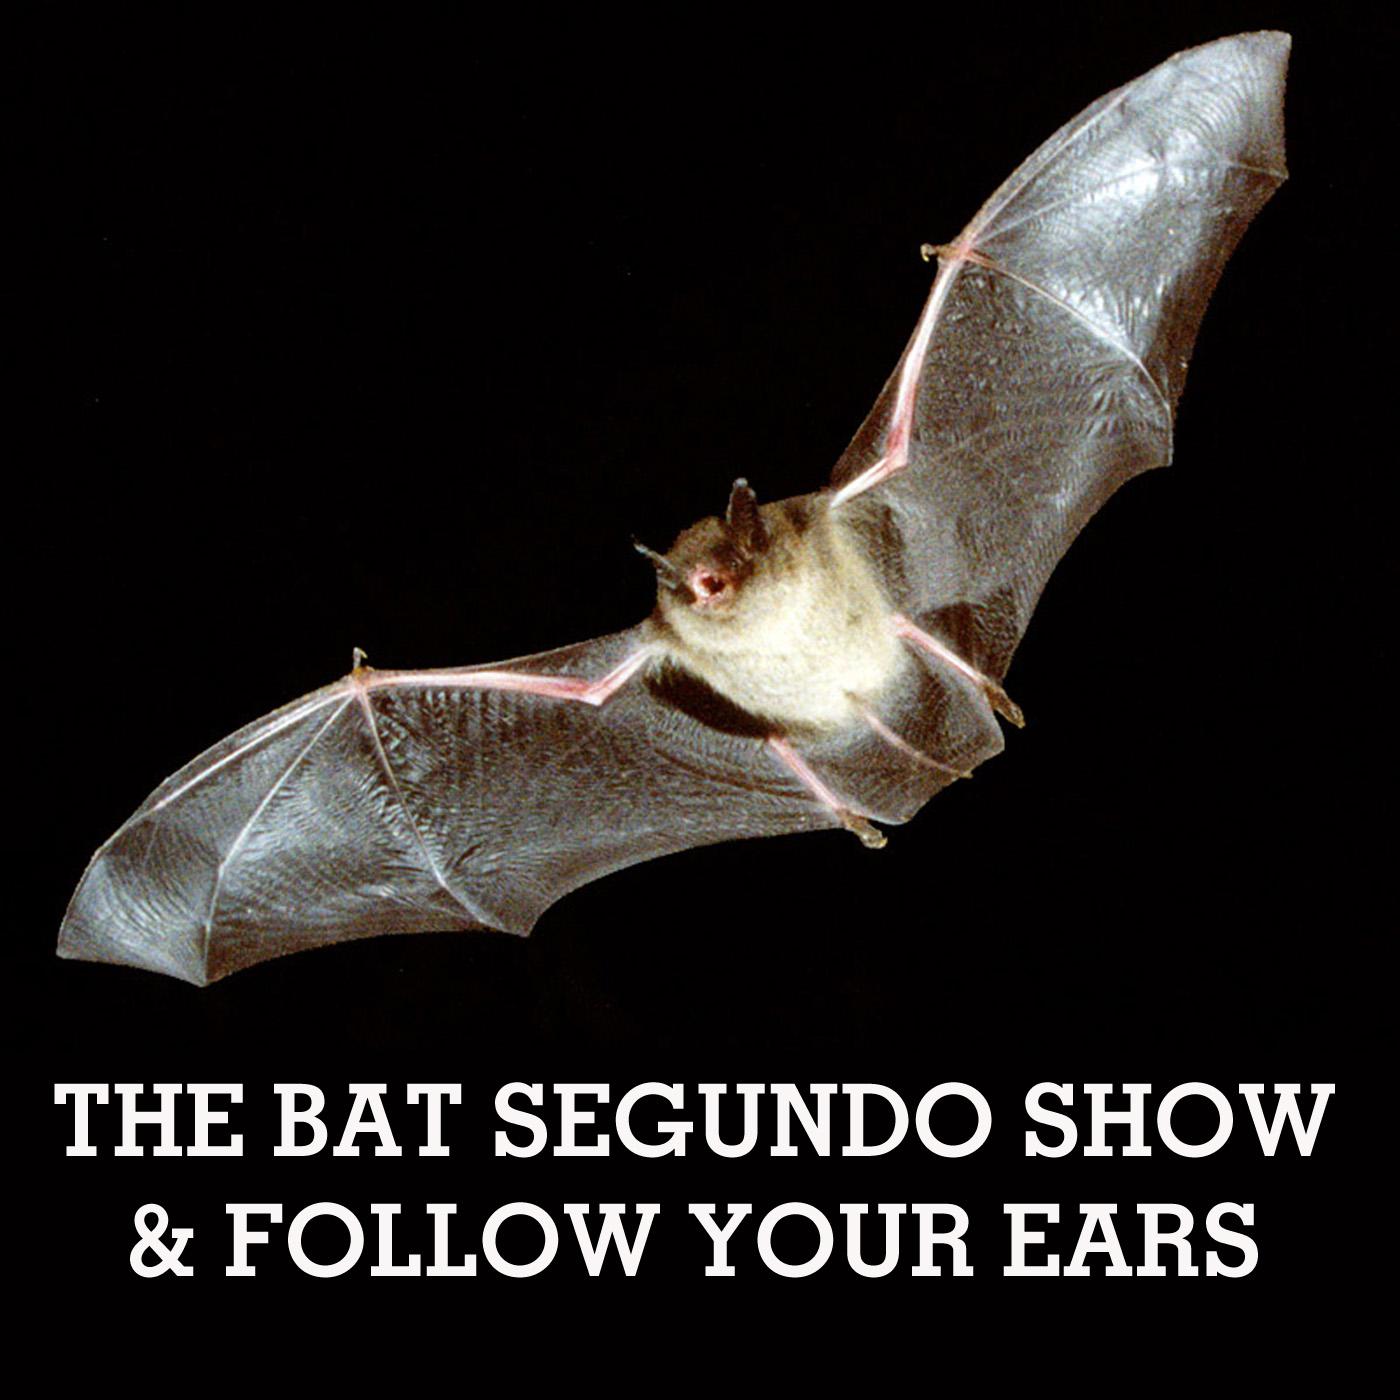 The Bat Segundo Show & Follow Your Ears